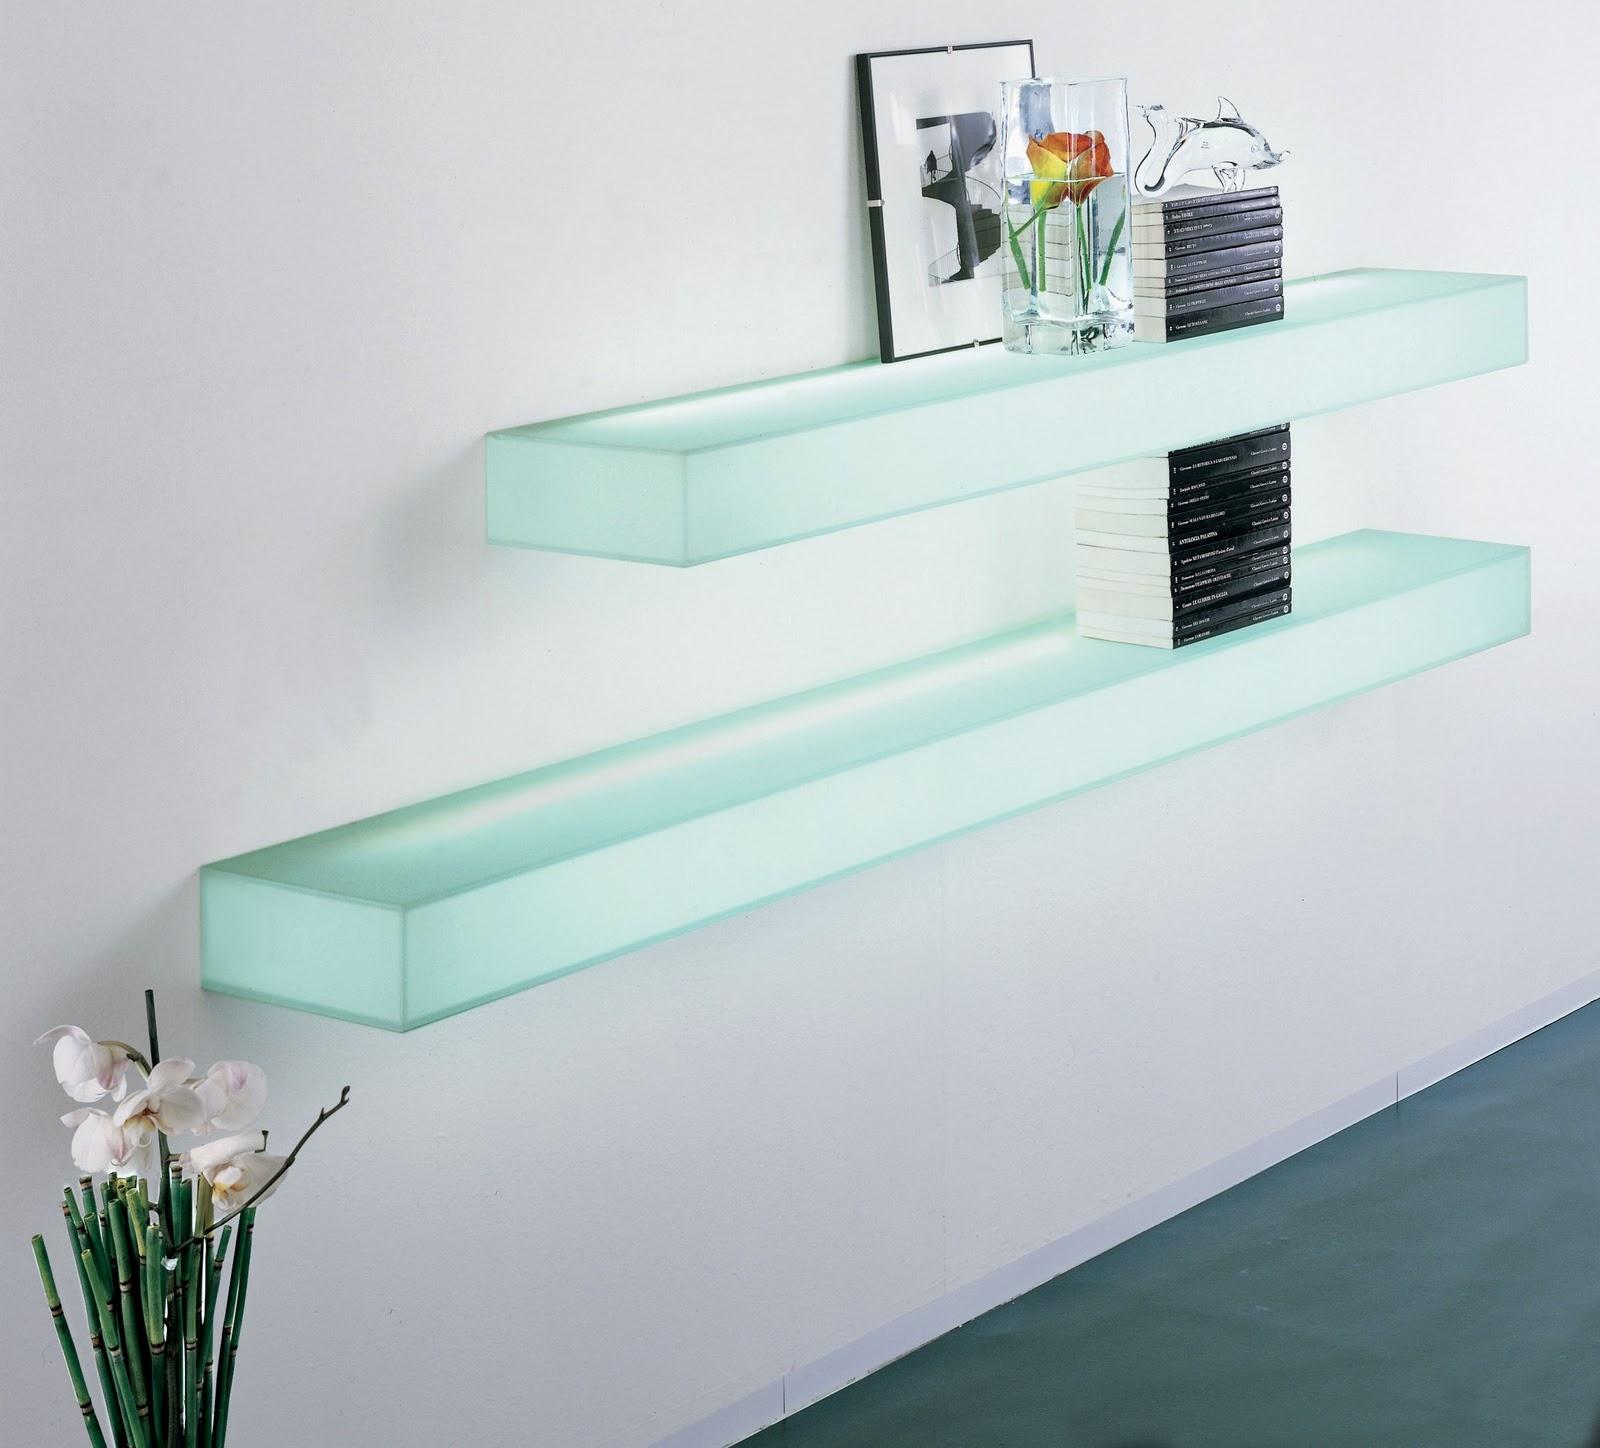 Furniture Awesome Illuminated Glass Bar Shelves Led Shelves W With Regard To Illuminated Glass Shelf (#1 of 12)